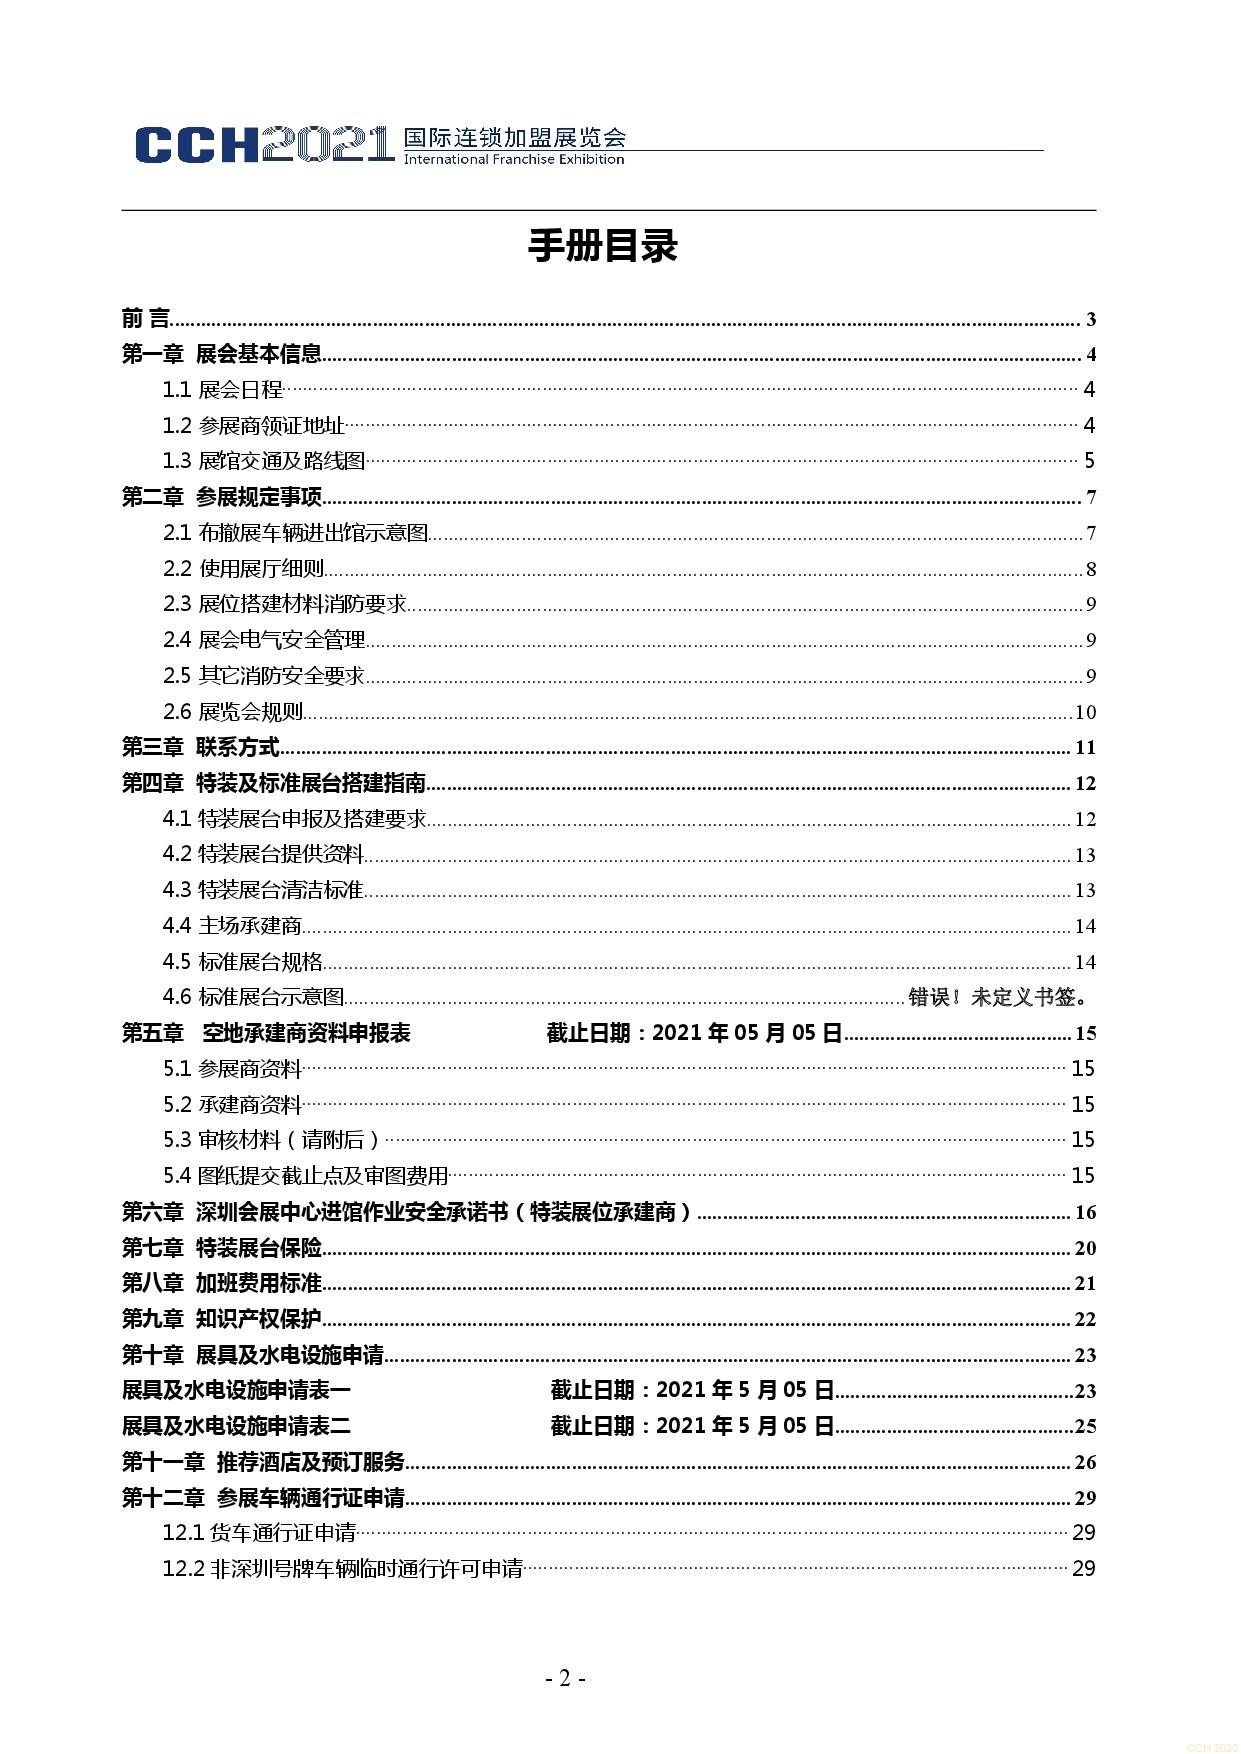 0416CCH深圳展参展商手册4.16-002.jpg